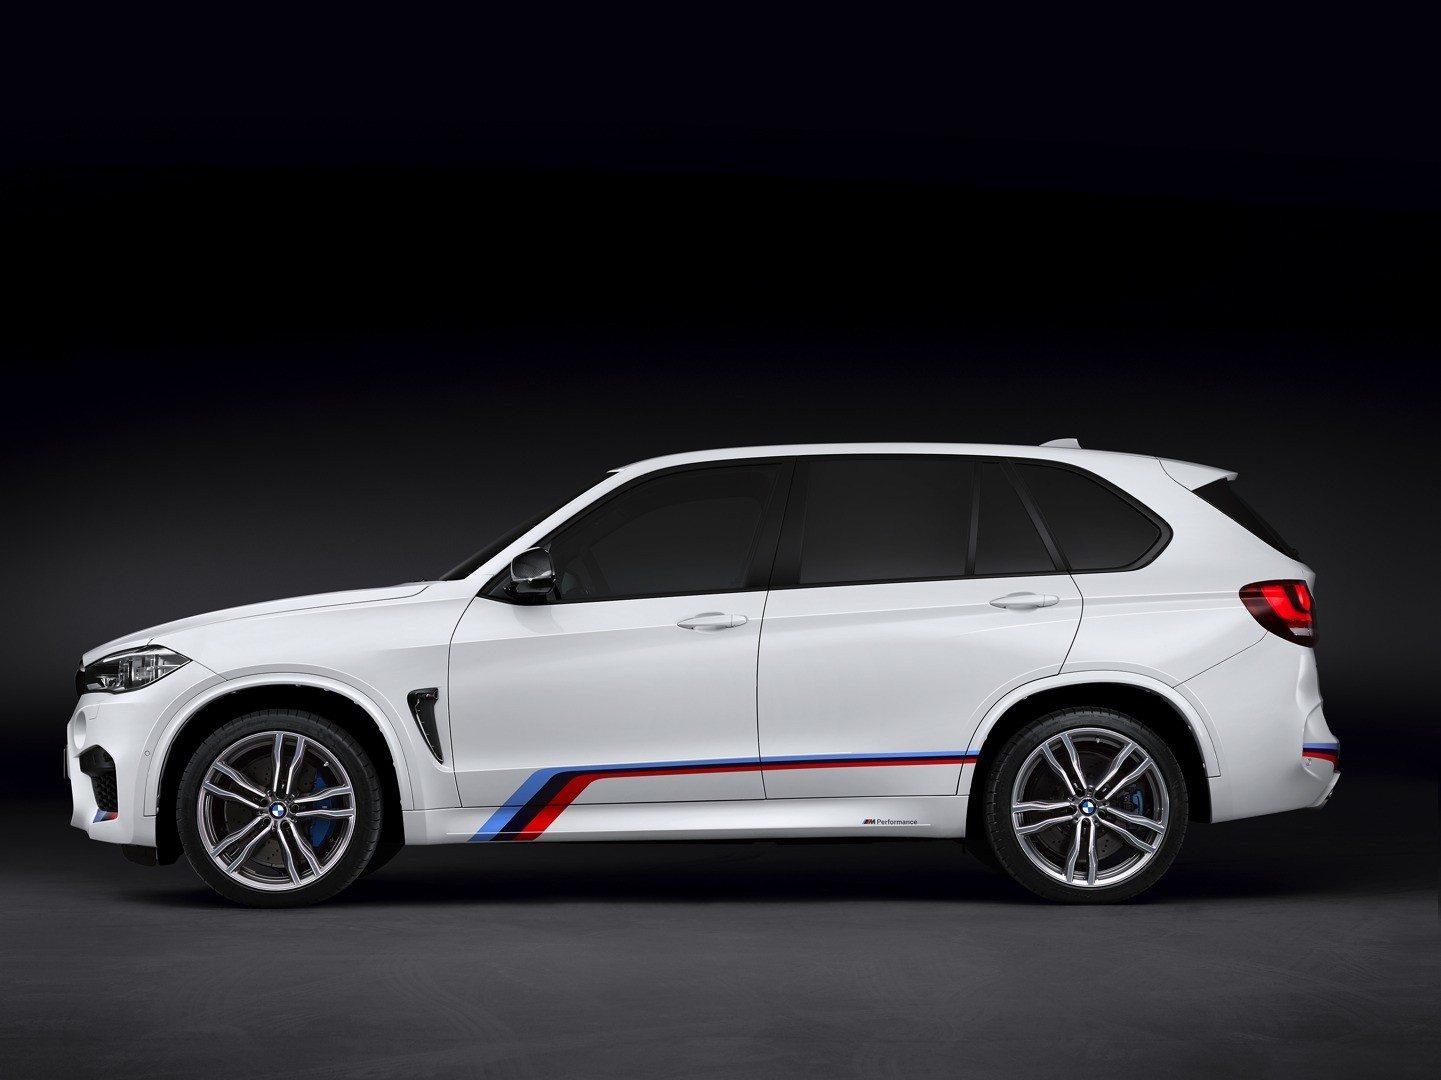 BMW X5 M - M Performance Parts